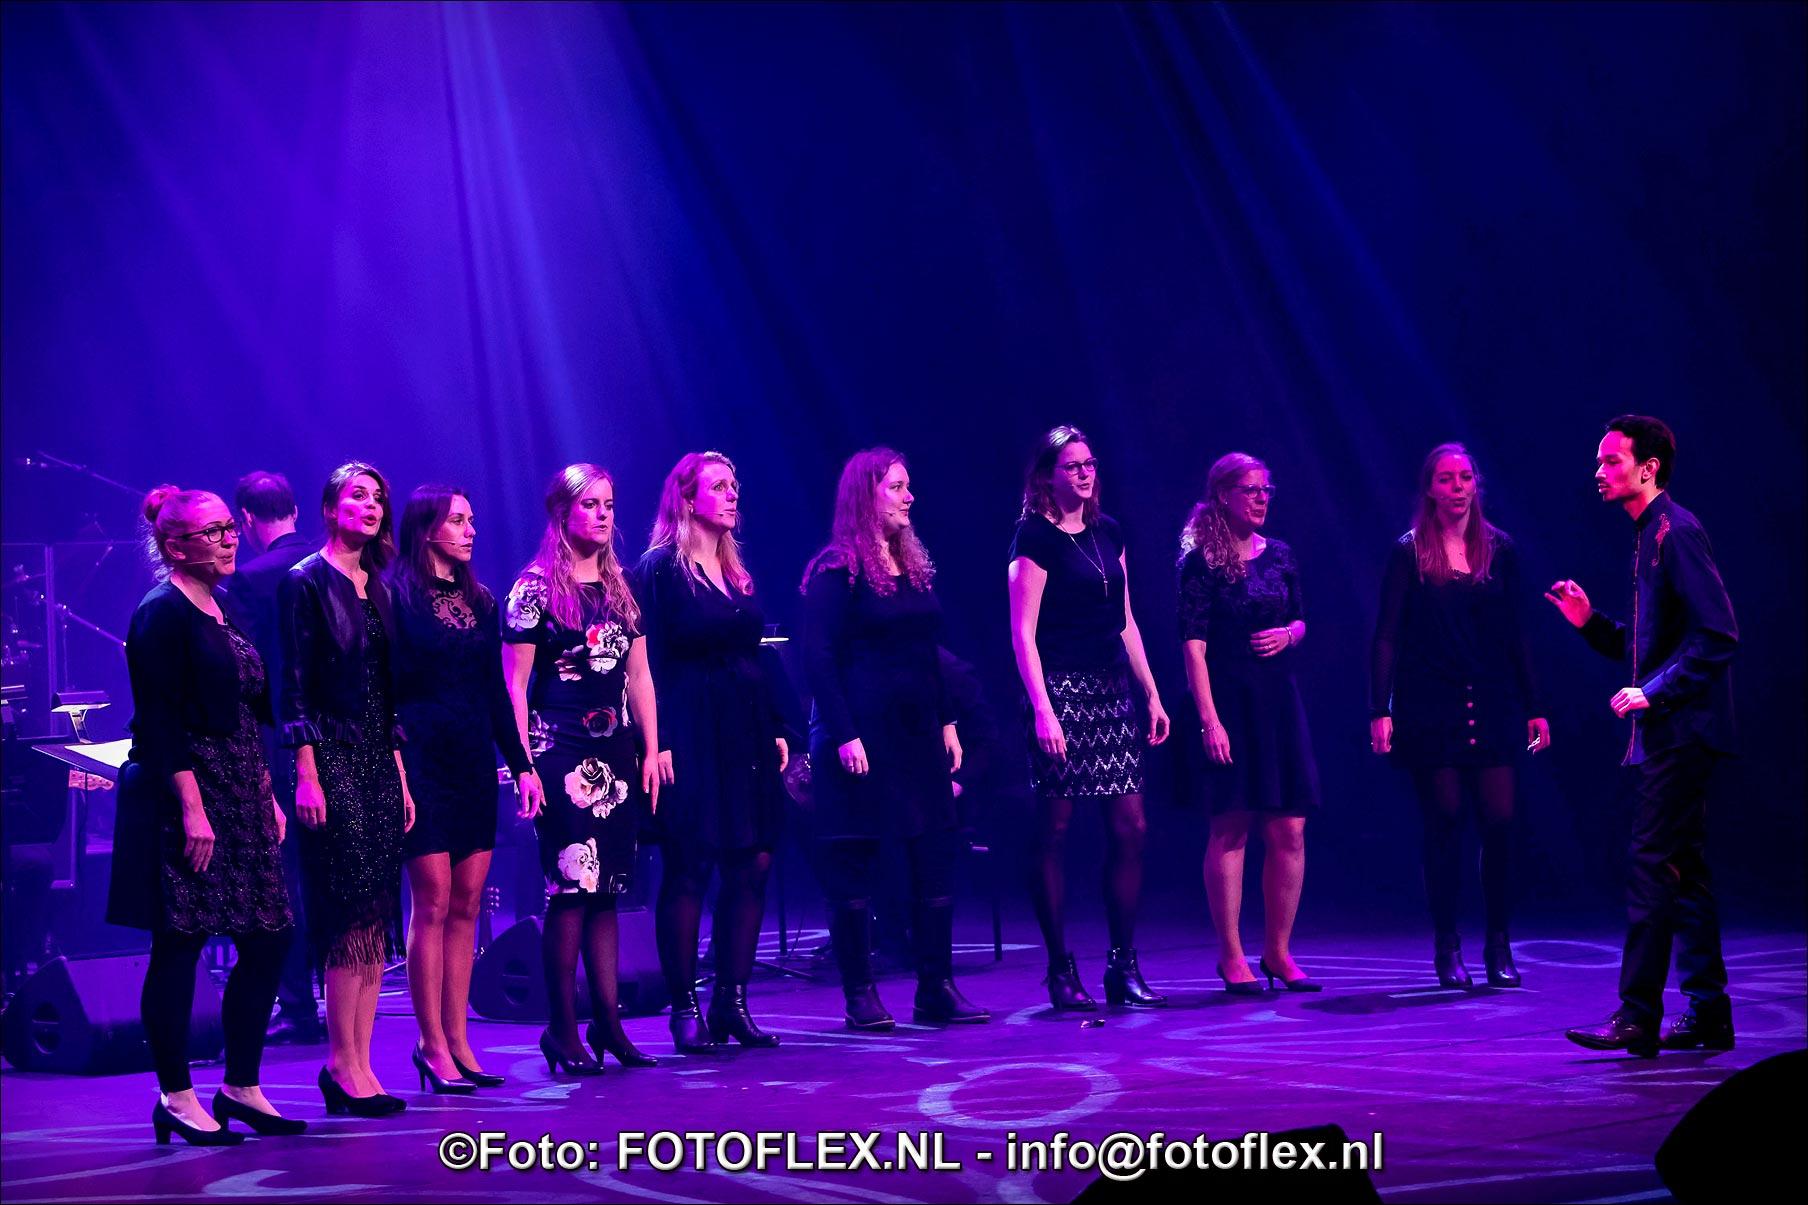 0389-CopyrightFOTOFLEX.NL07012020